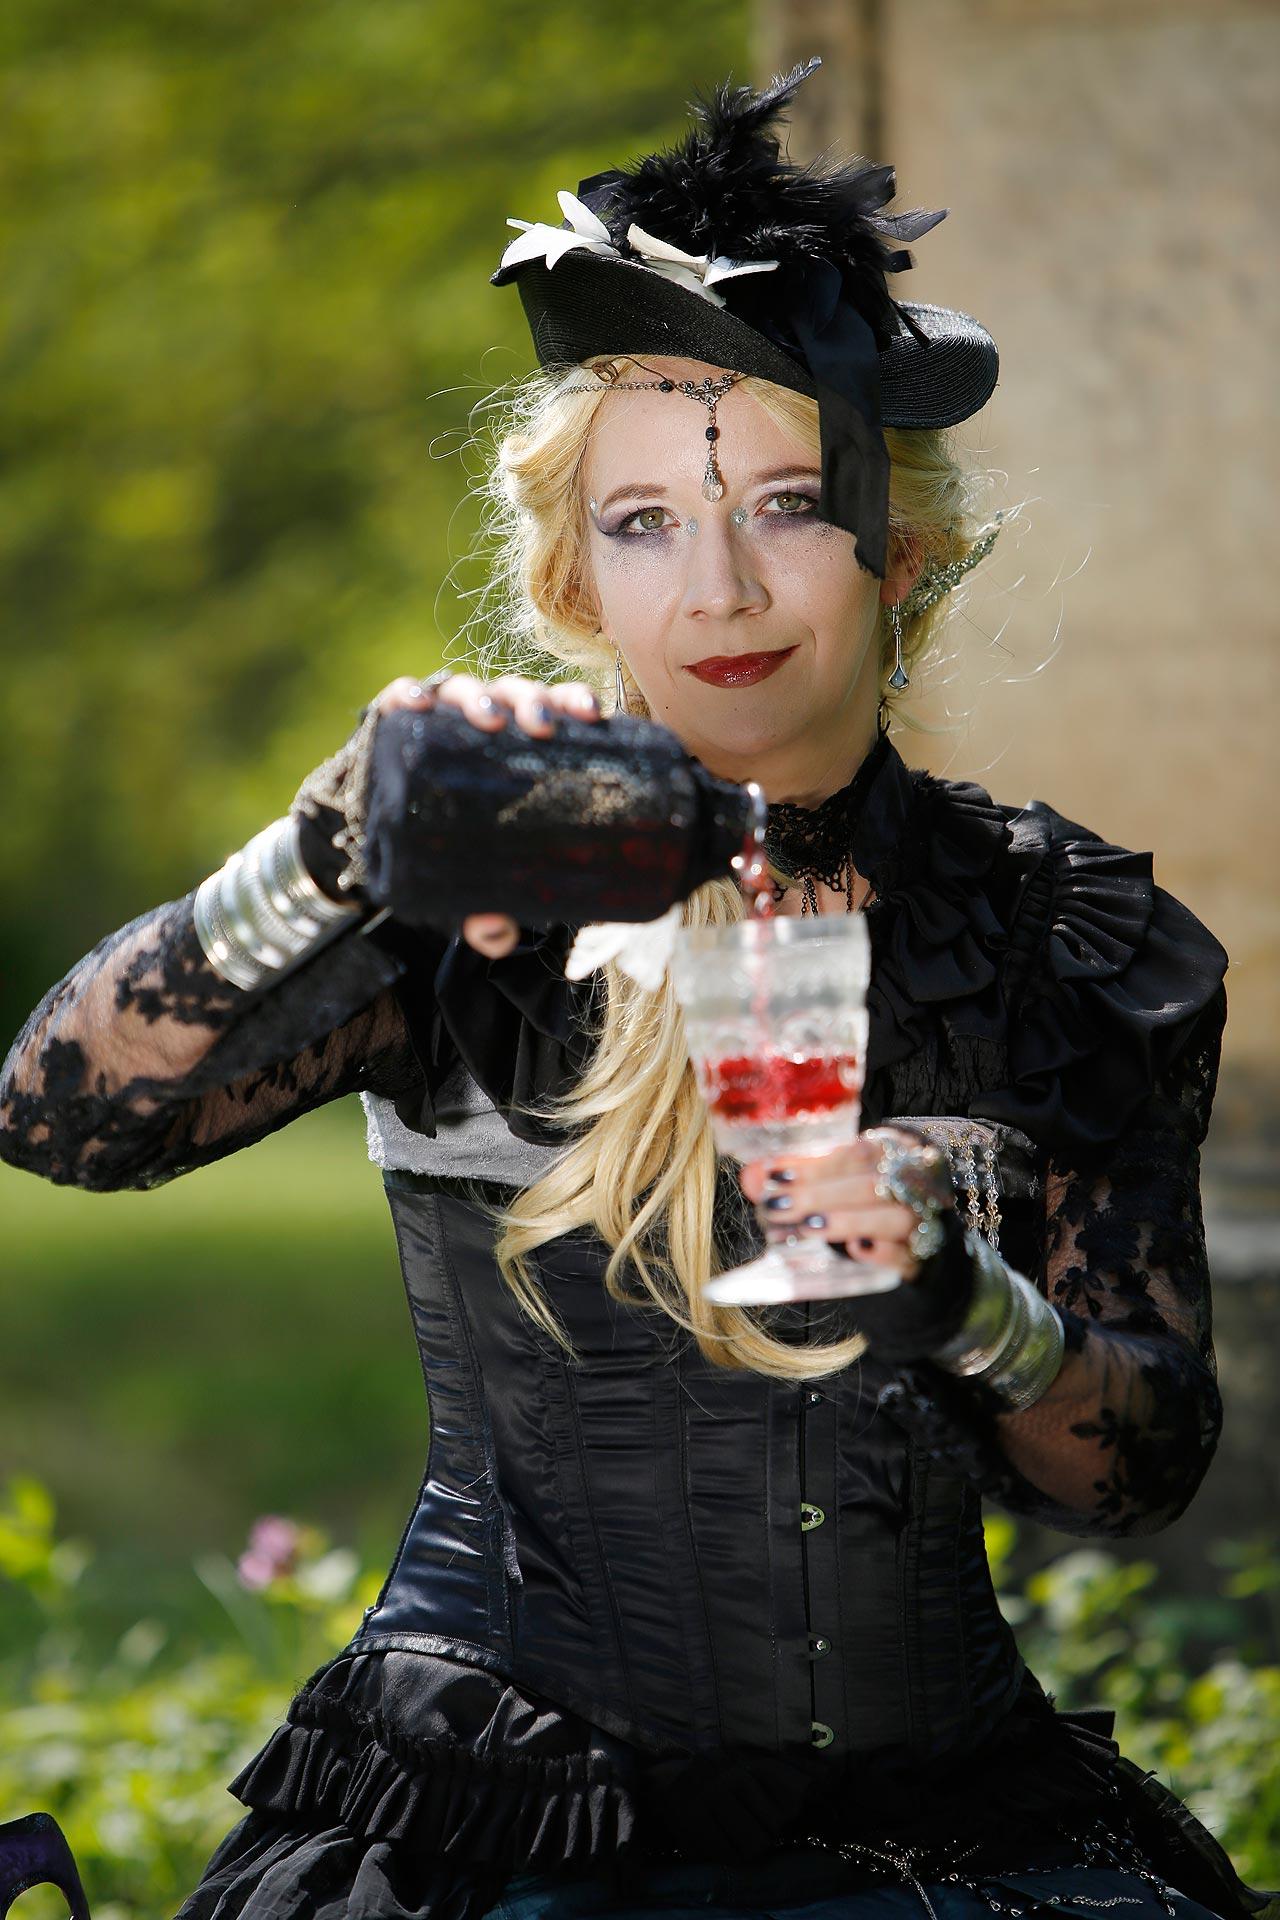 Hang zum Verkleiden: Mira Sommer mag fantasievolle Kostüme.